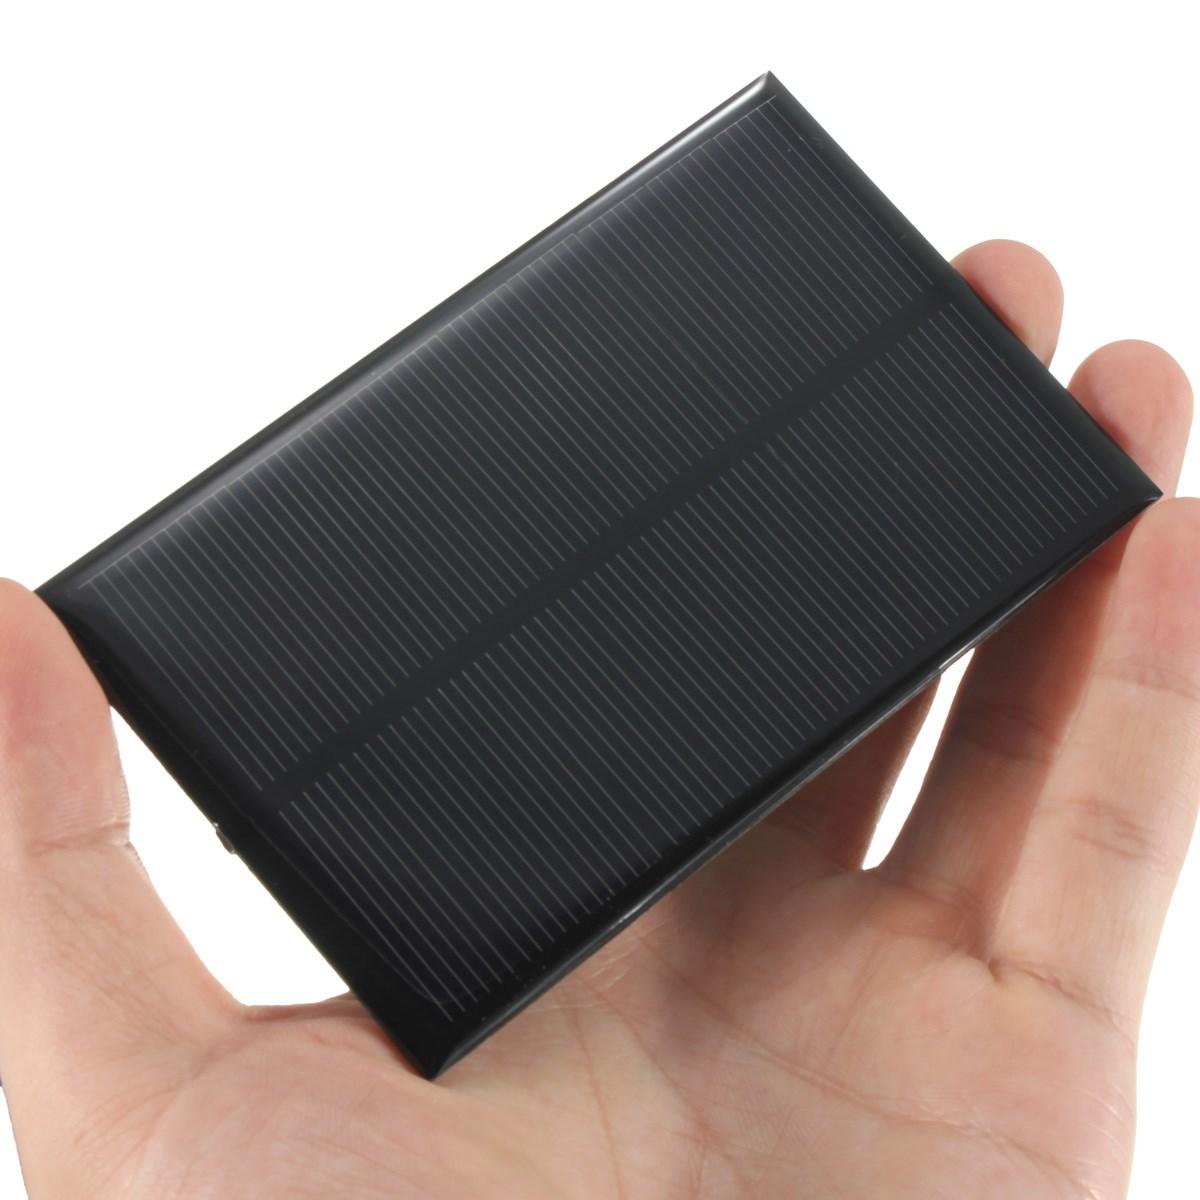 5V 1.25W 250mA Monocrystalline Silicon Epoxy Solar Panels Module kits Mini Solar Cells For Charging Cellphone Battery 110x70mm(China (Mainland))